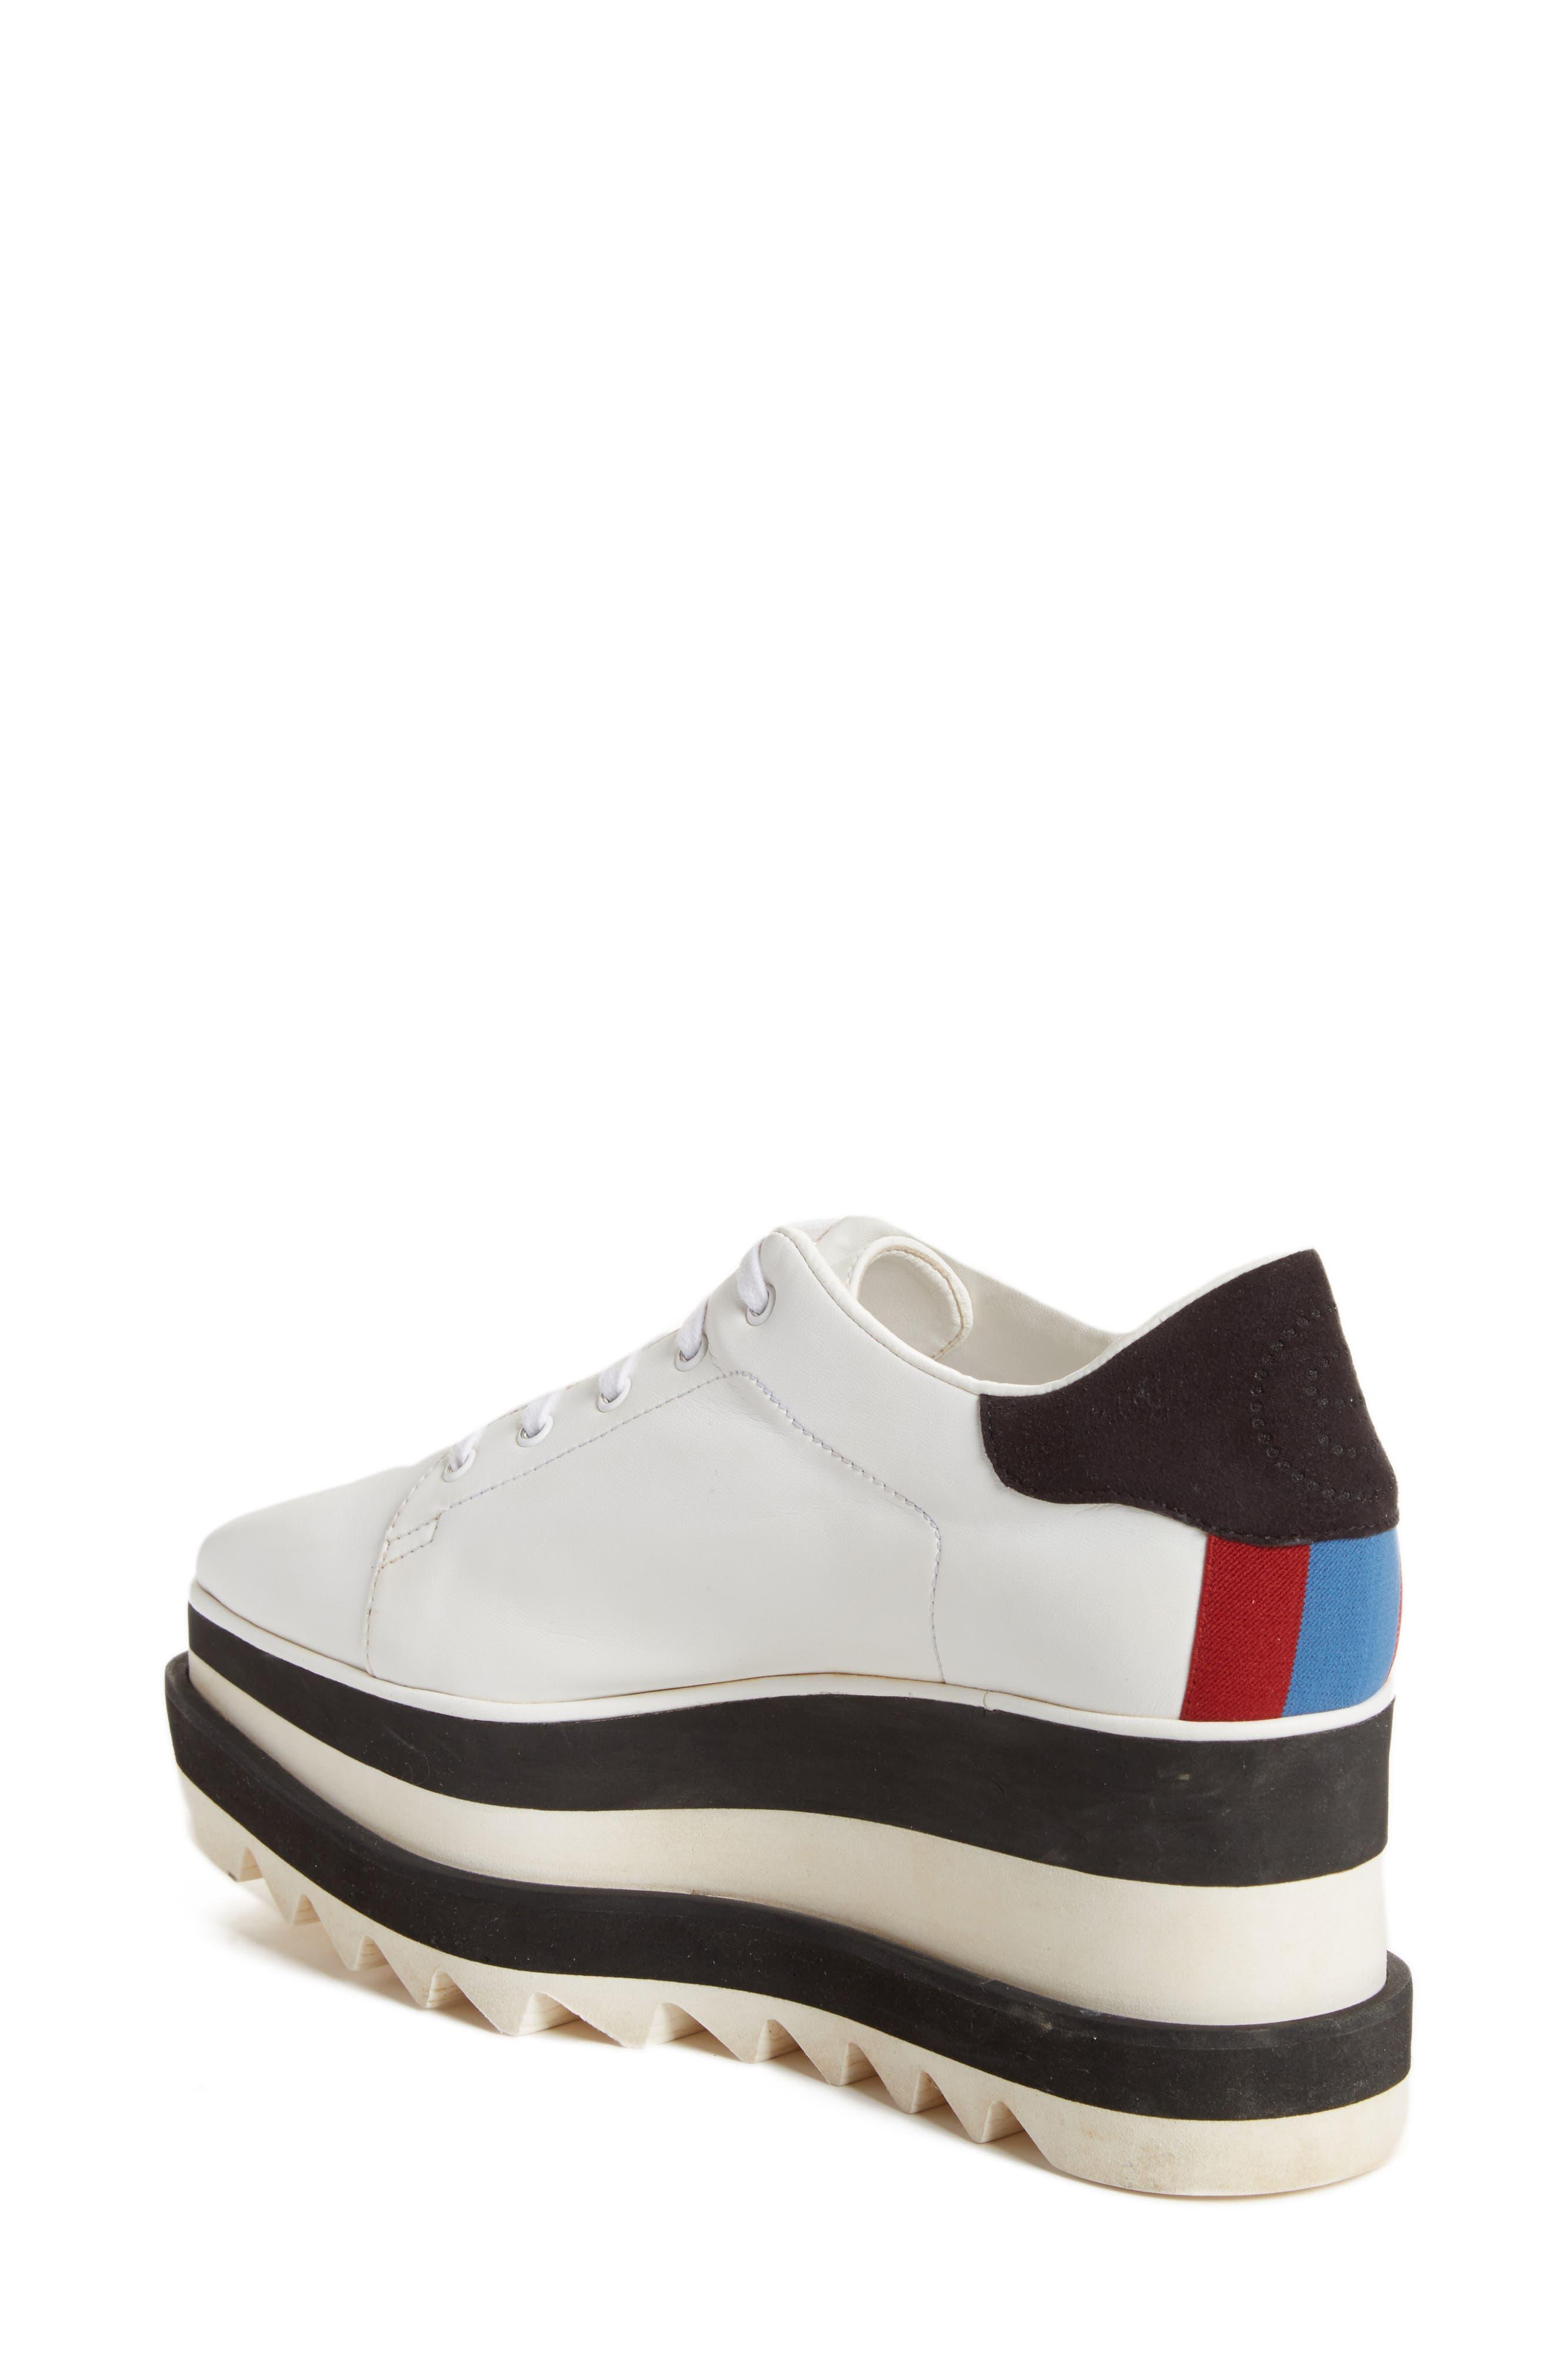 Alternate Image 2  - Stella McCartney Sneak-Elyse Flatform Sneaker (Women)